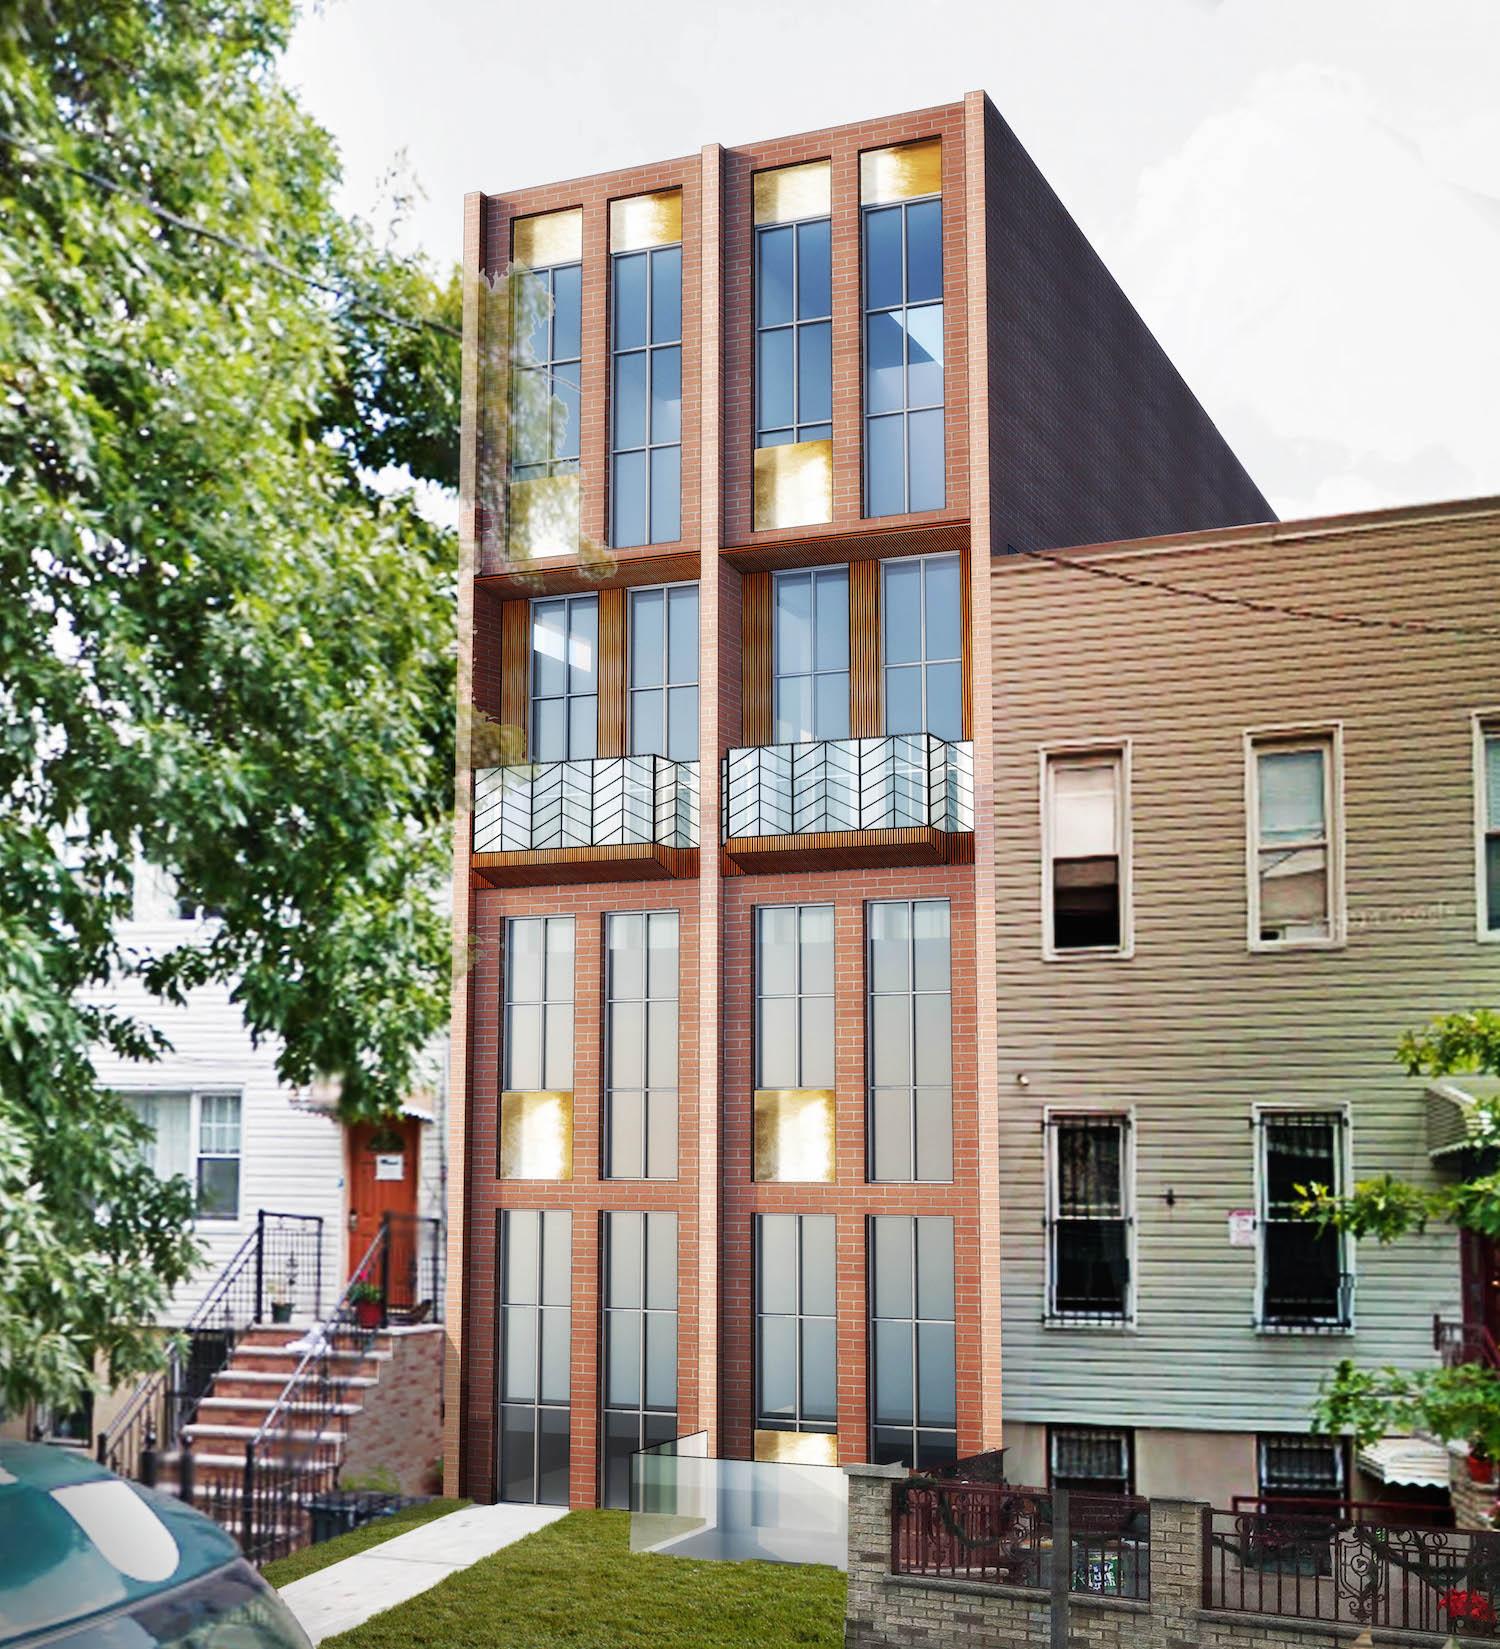 452 Harman Street, rendering by Opera Studio Architecture